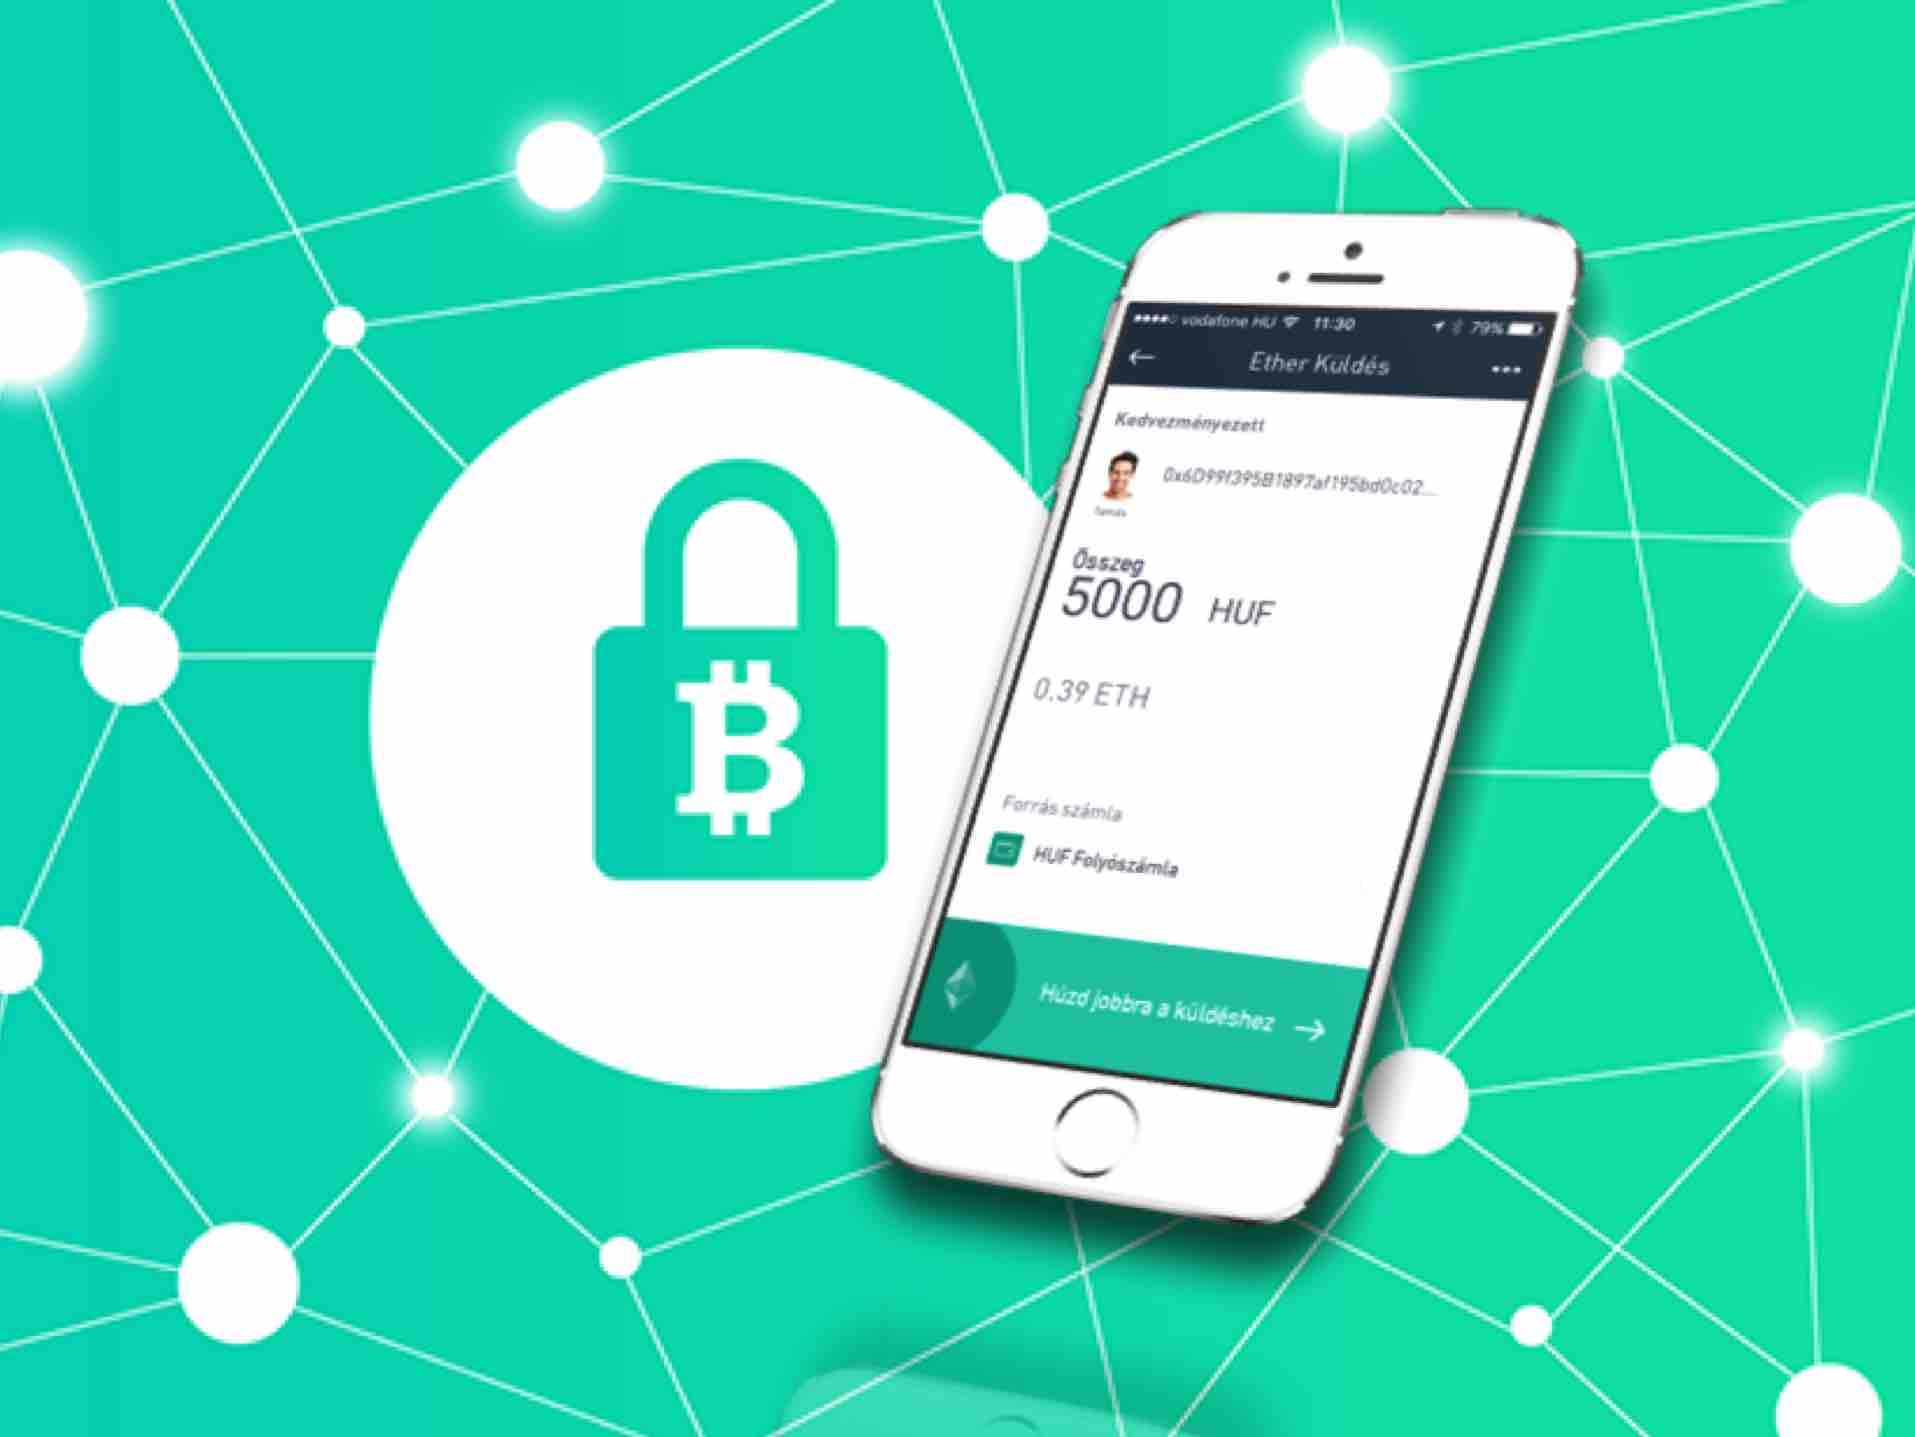 Shinrai blockchain api magyar fintech piacter